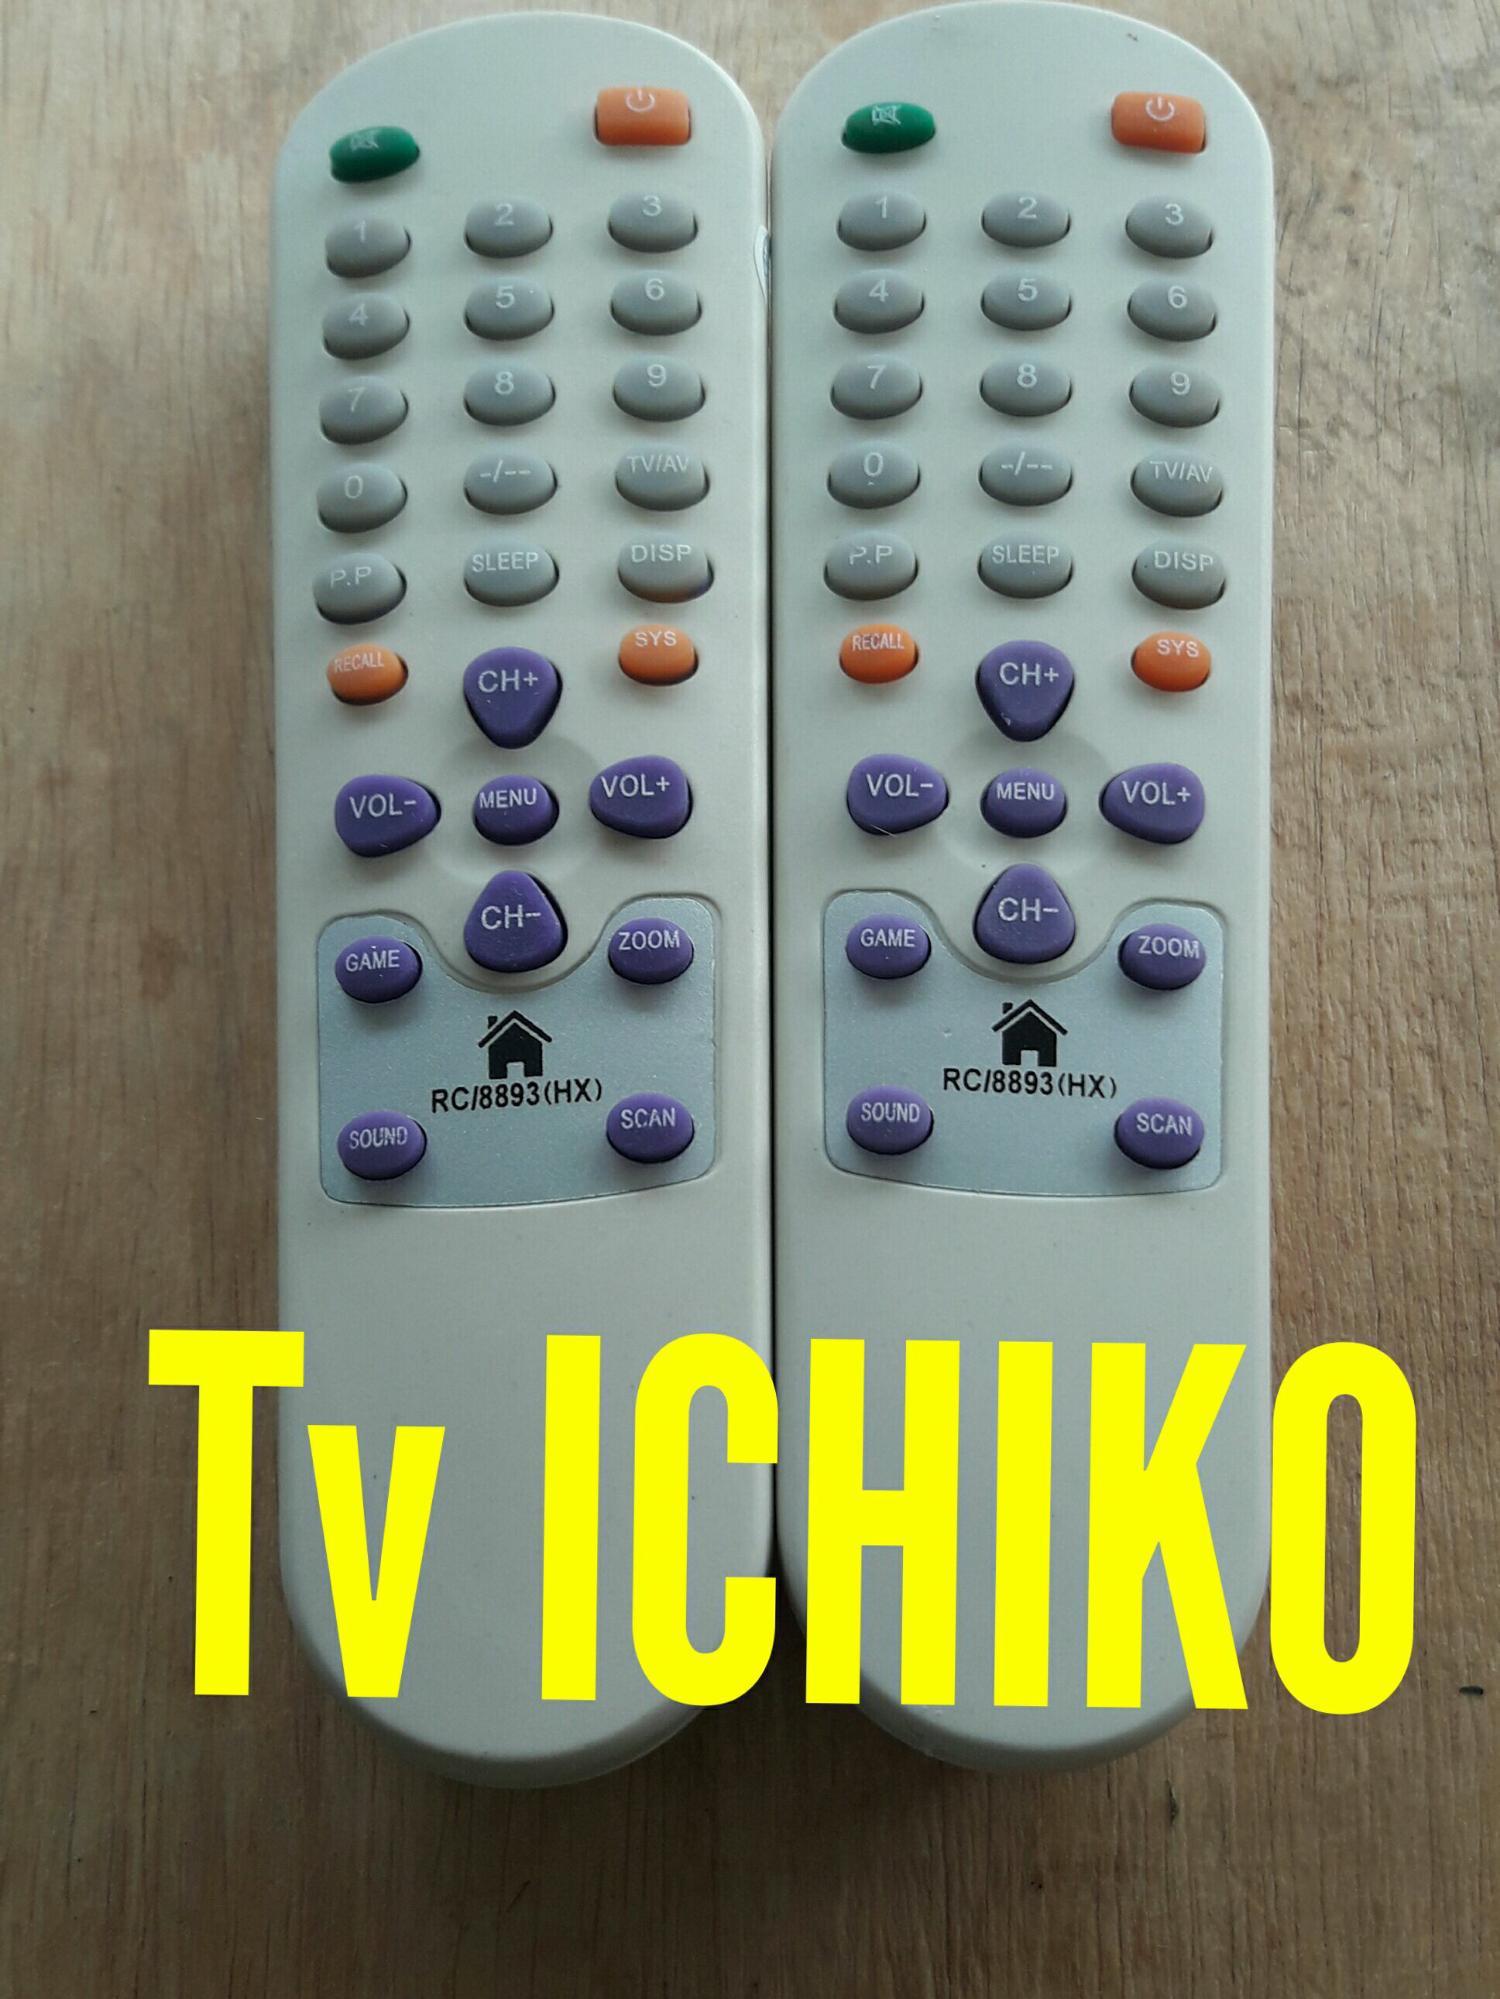 Remote tv ichiko